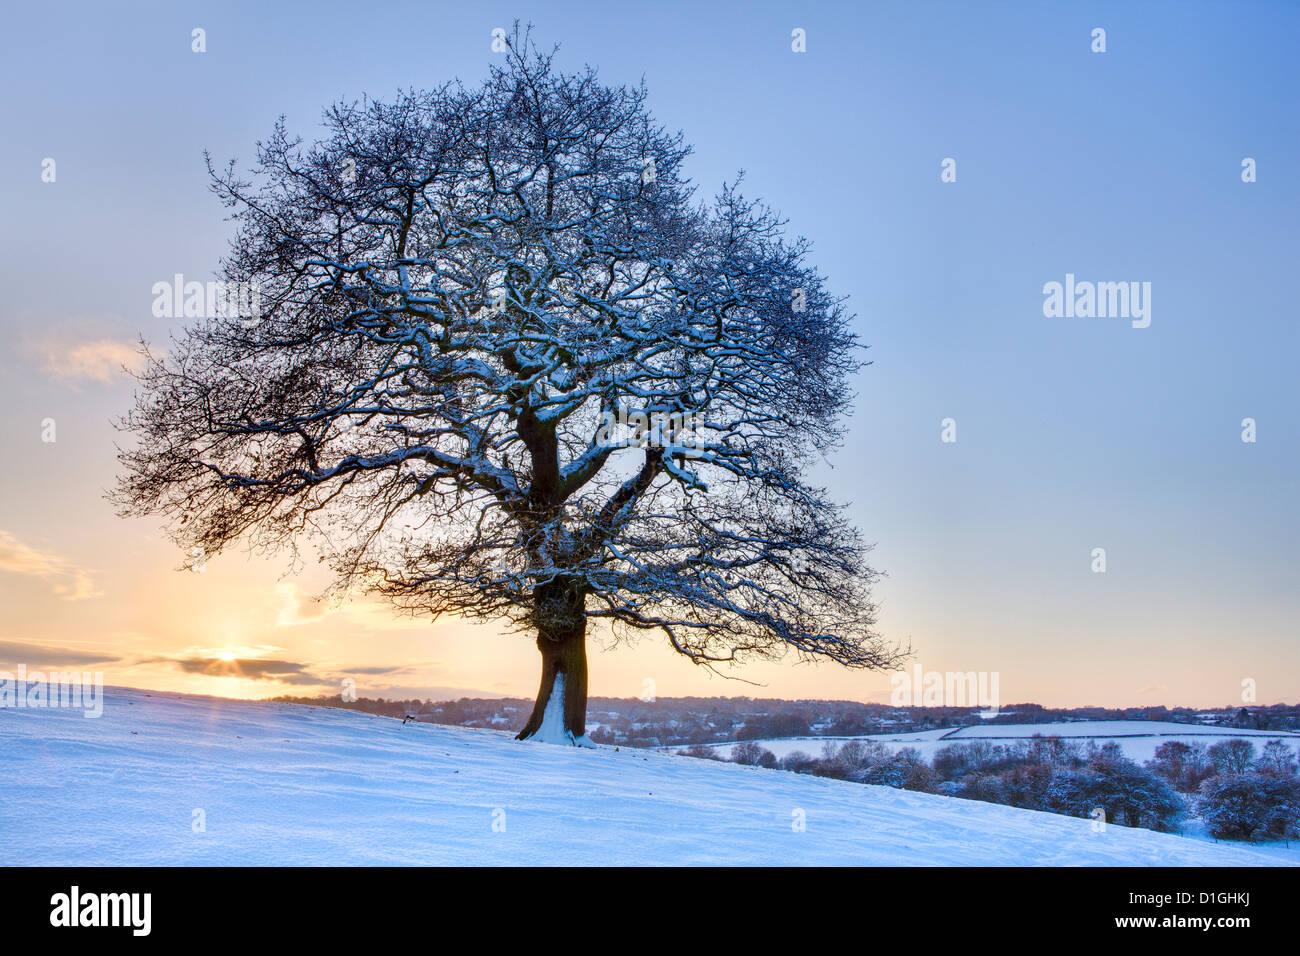 Árbol cubierto de nieve al atardecer, cerca de madera, Hetchell Thorner, West Yorkshire, Yorkshire, Inglaterra, Imagen De Stock